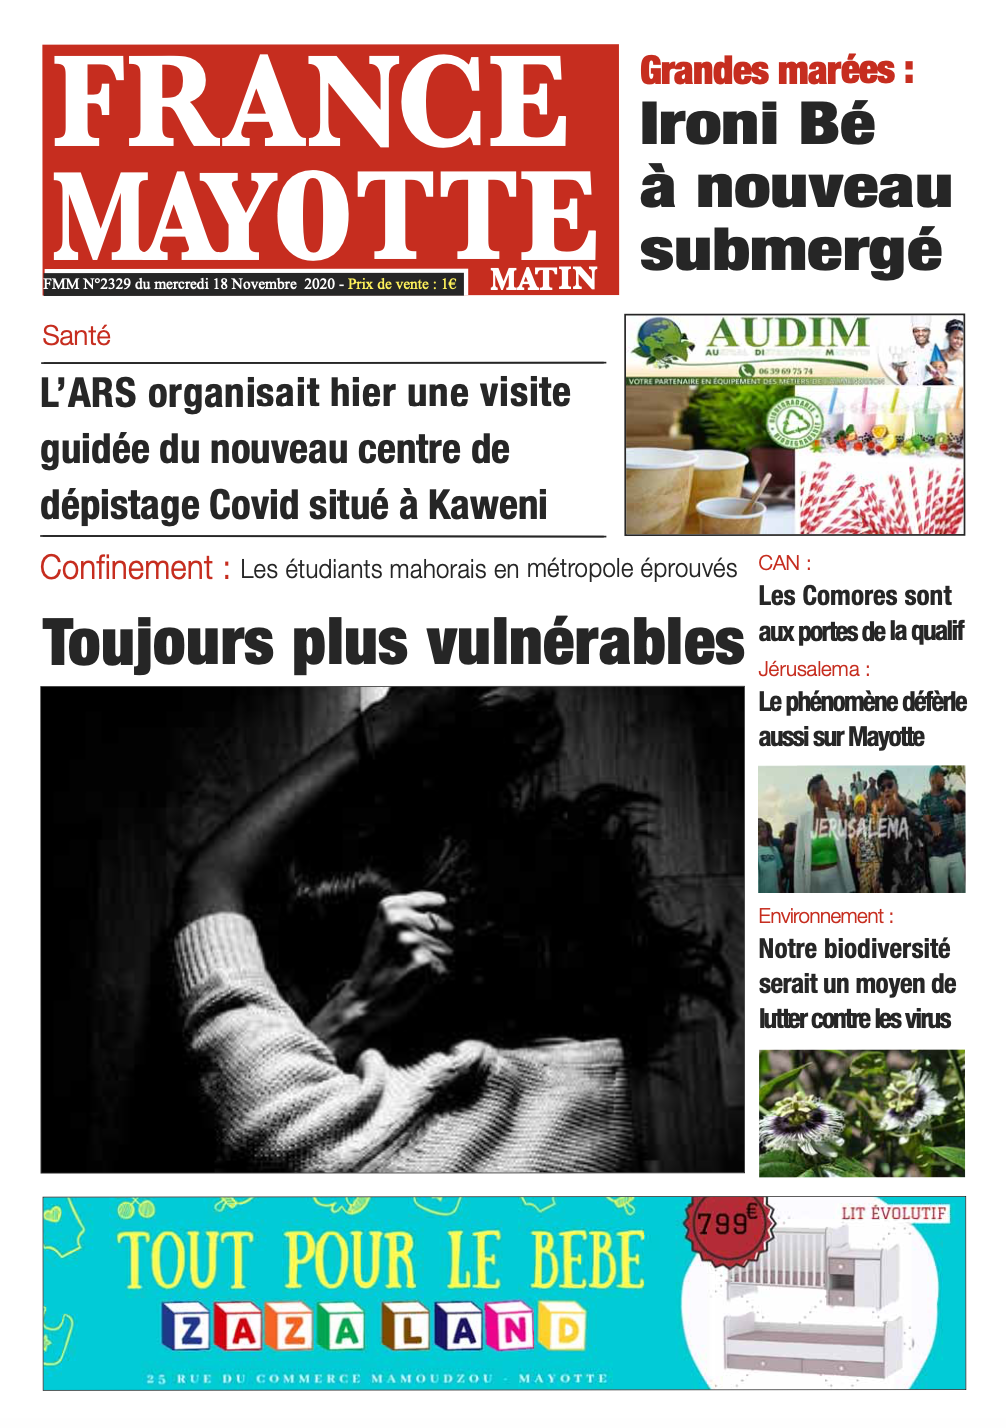 France Mayotte Mercredi 18 novembre 2020